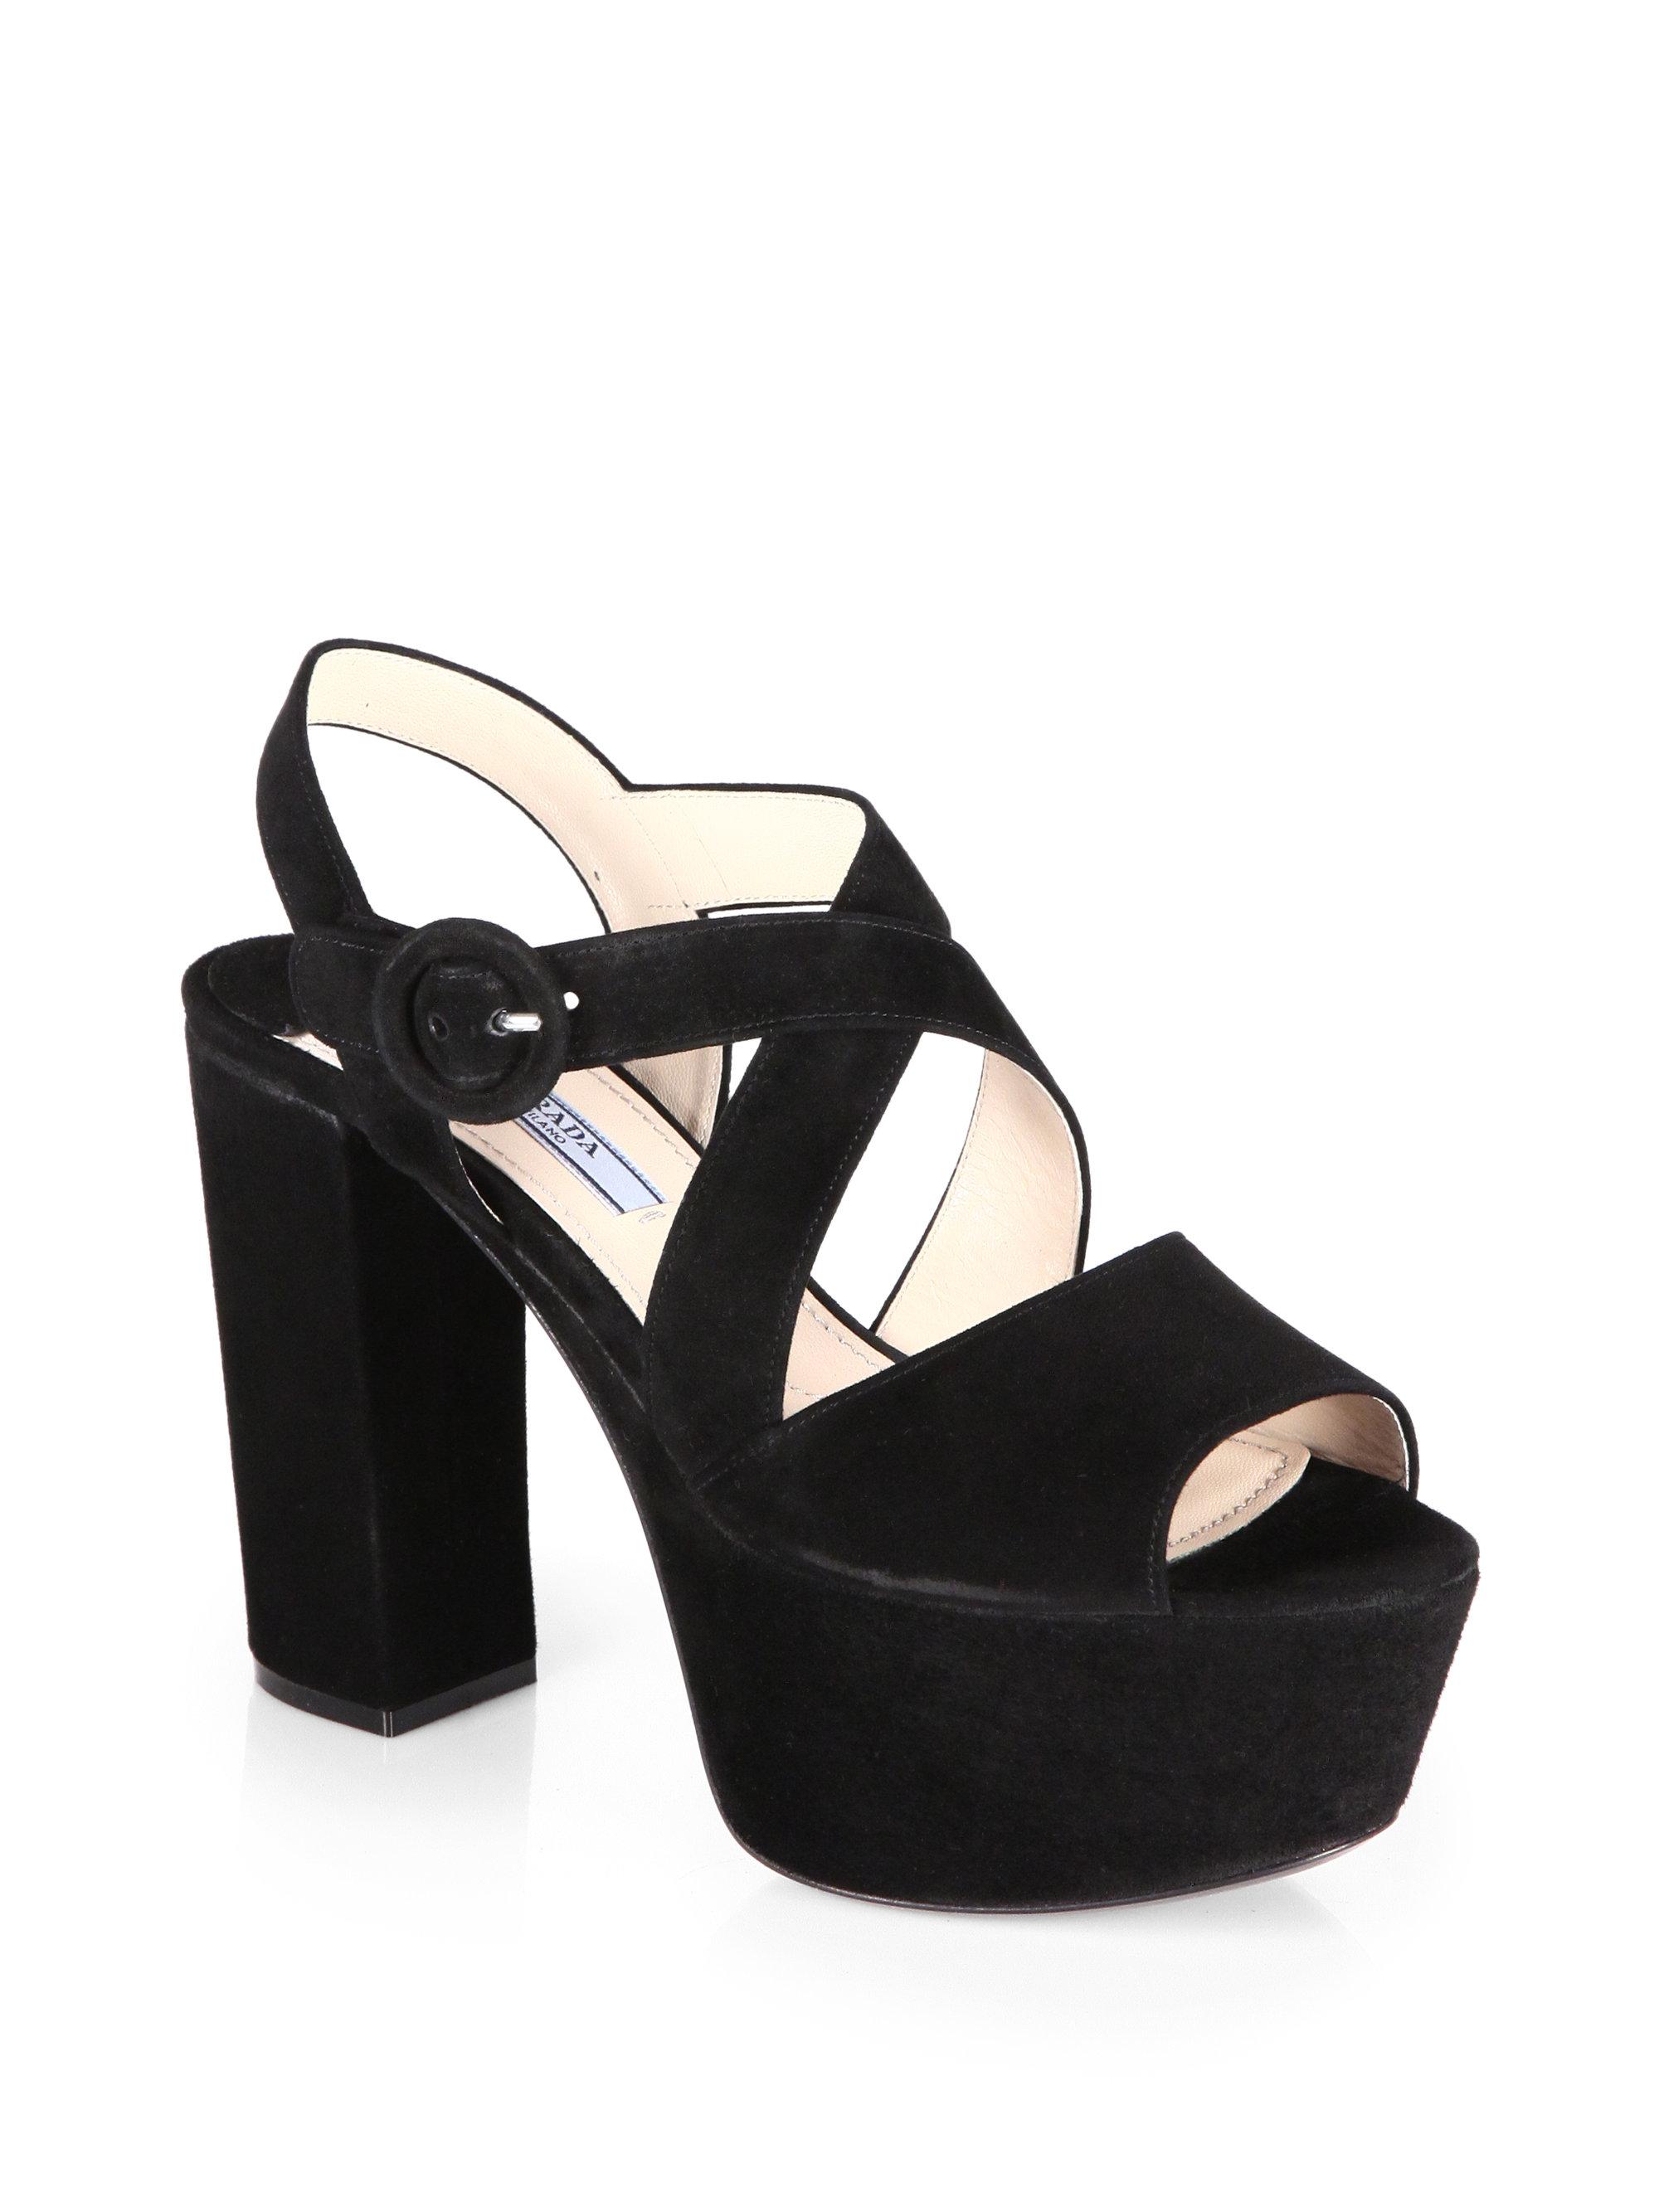 710dfbf5c466 Prada Suede Crisscross Platform Sandals in Black - Lyst